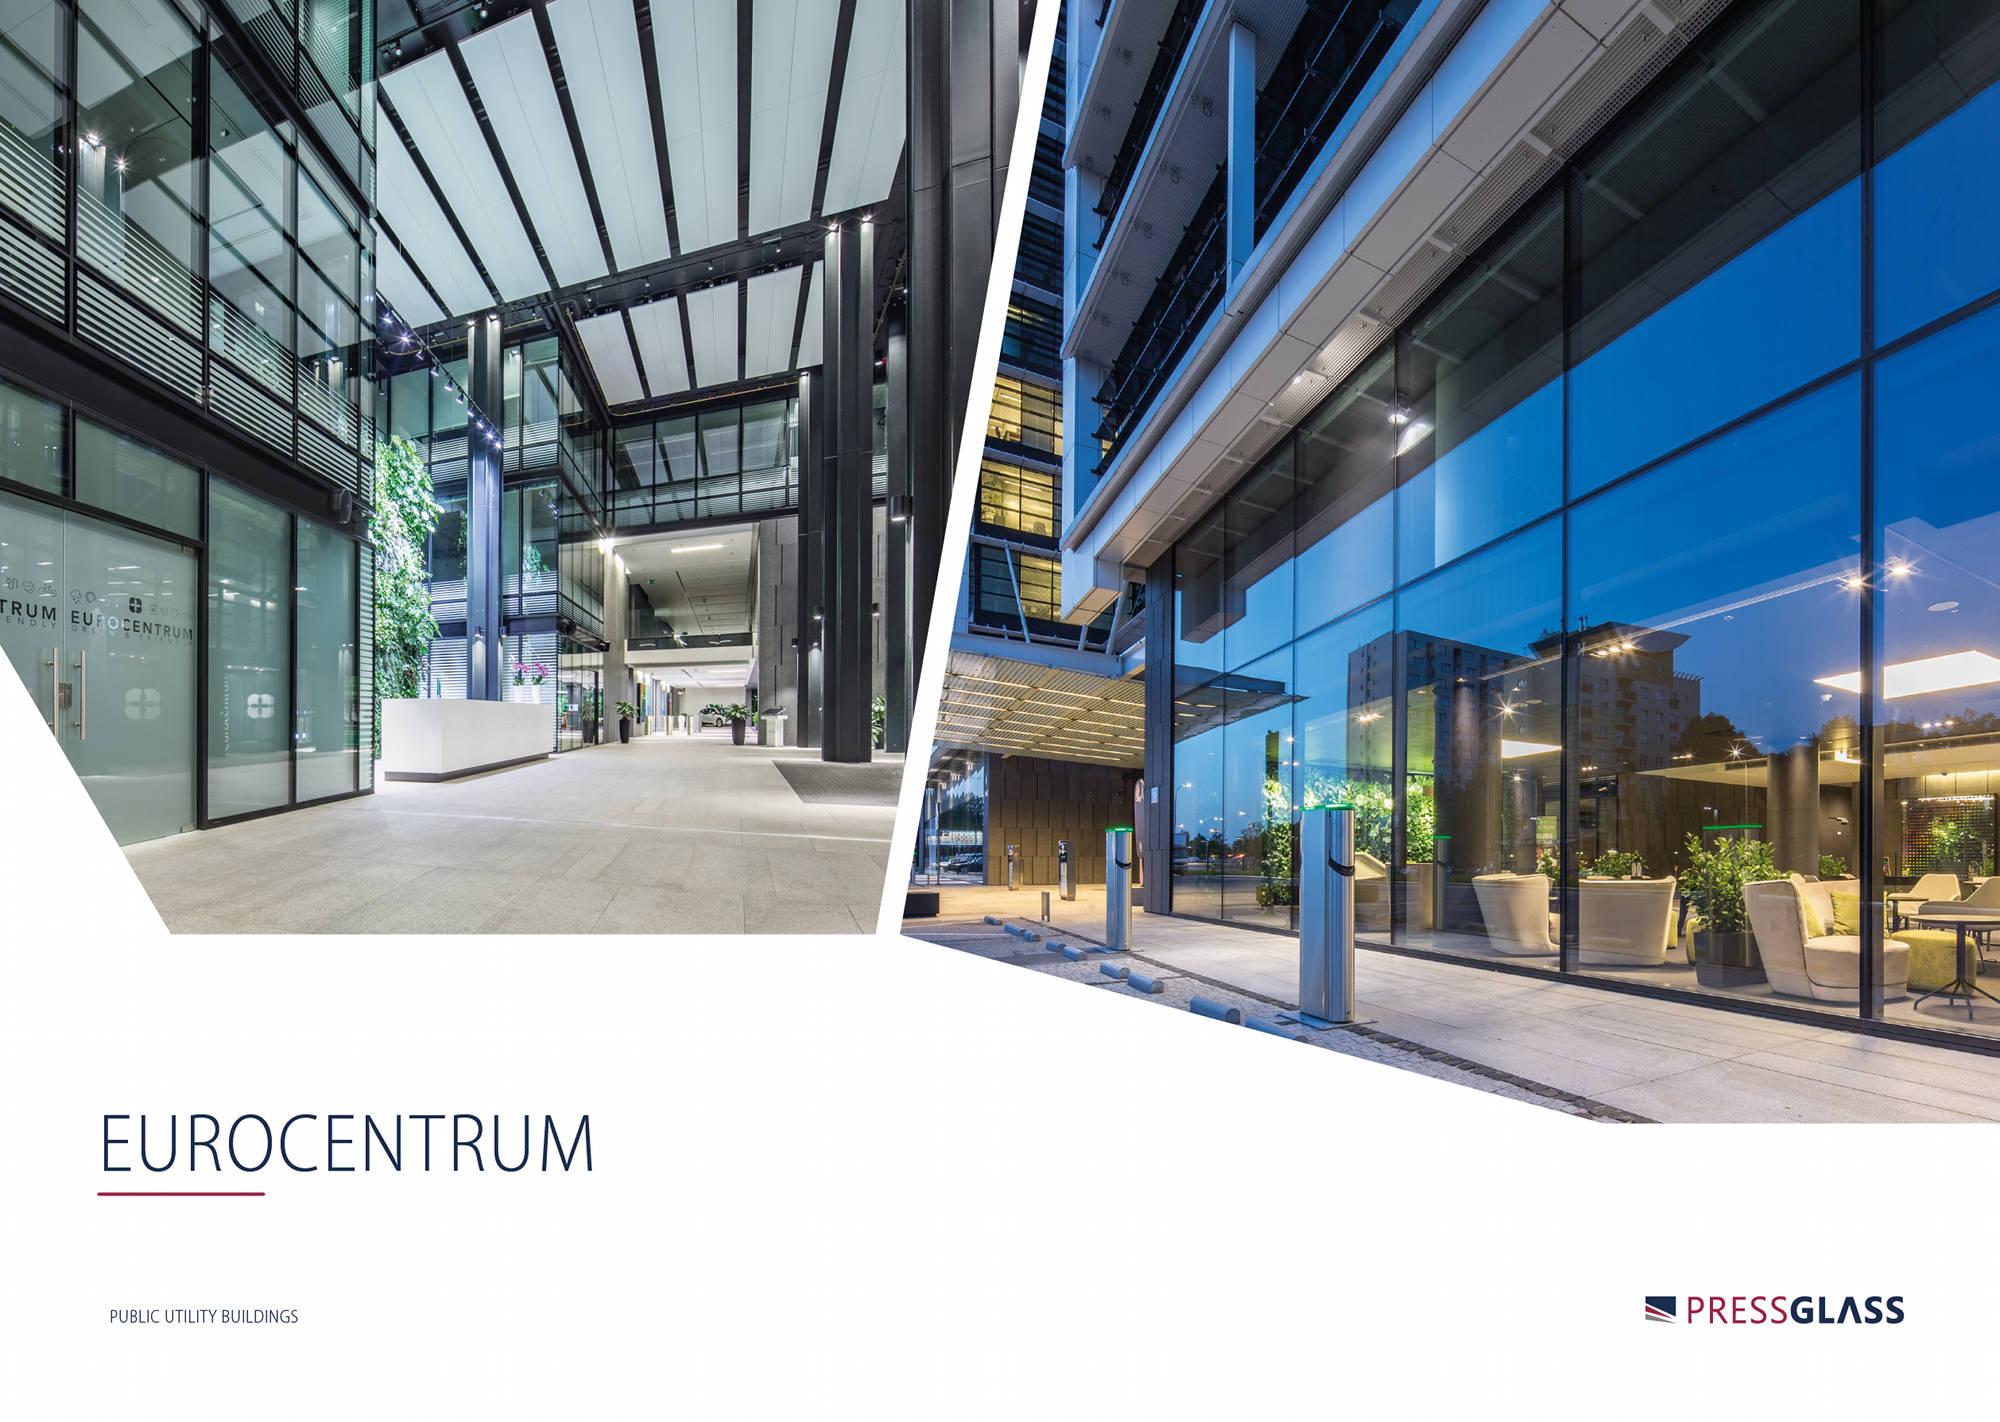 Eurocentrum 03 (press material)